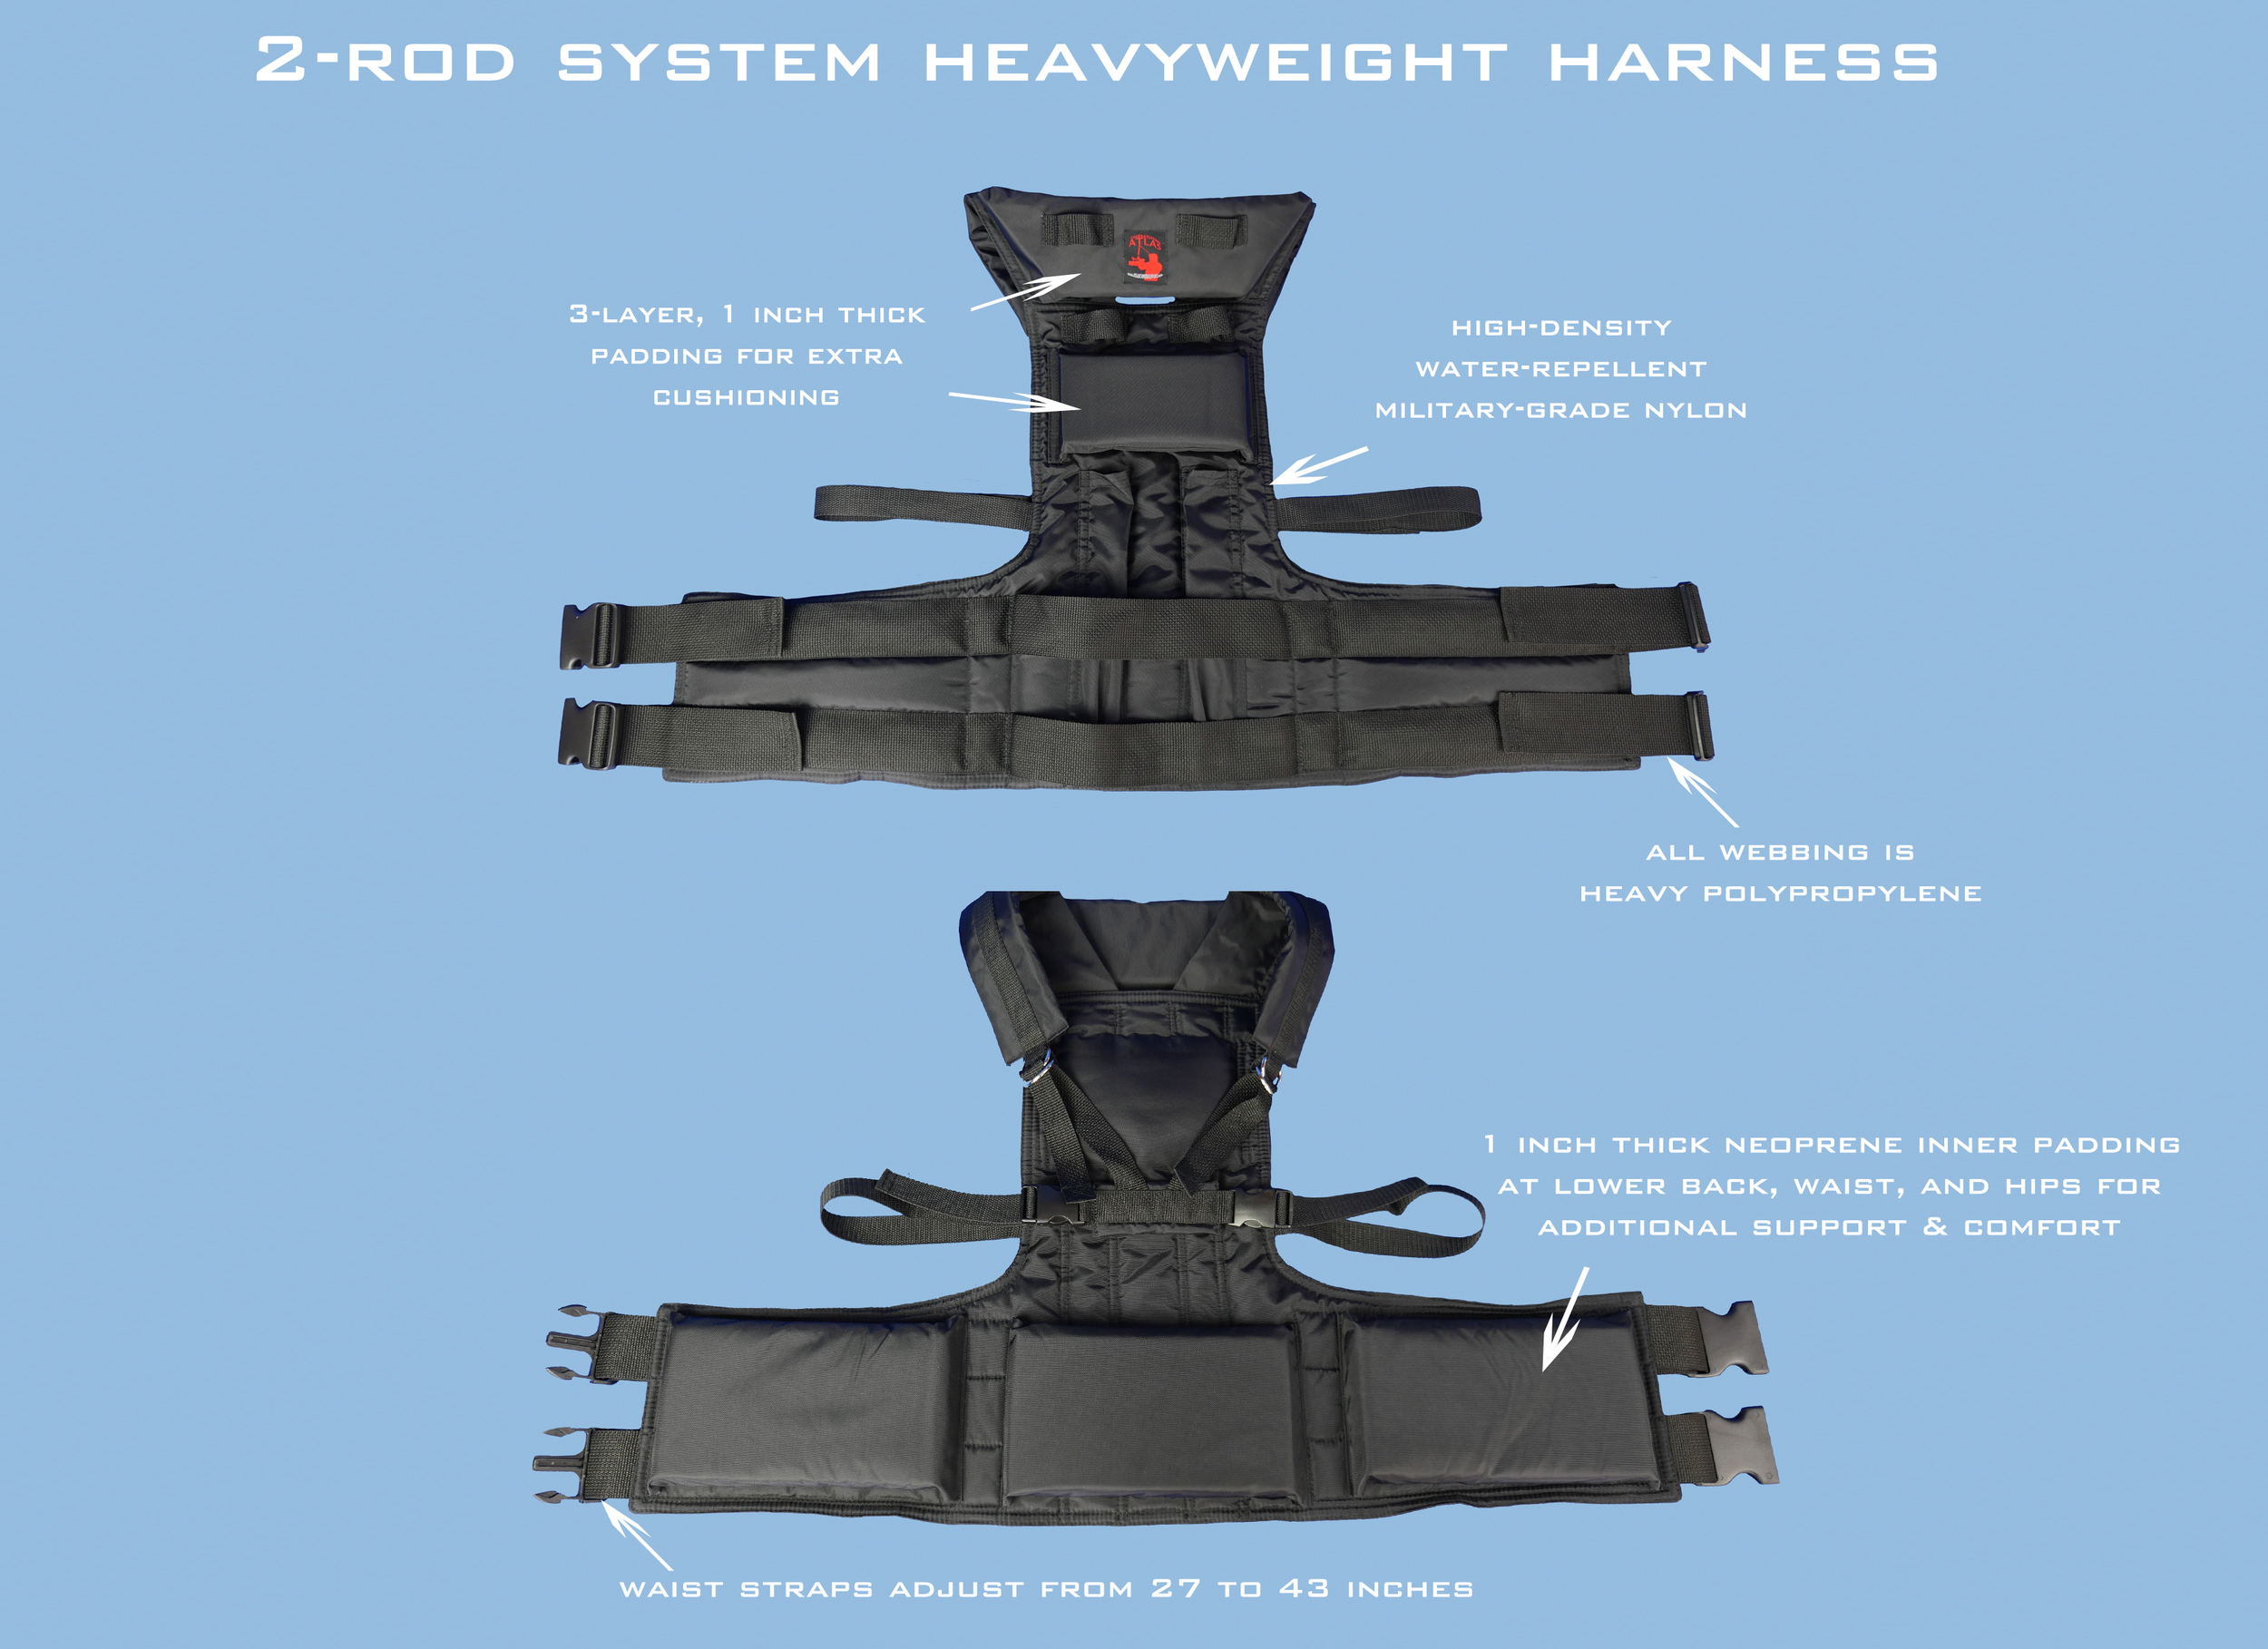 2-rod hvywt harness.jpg